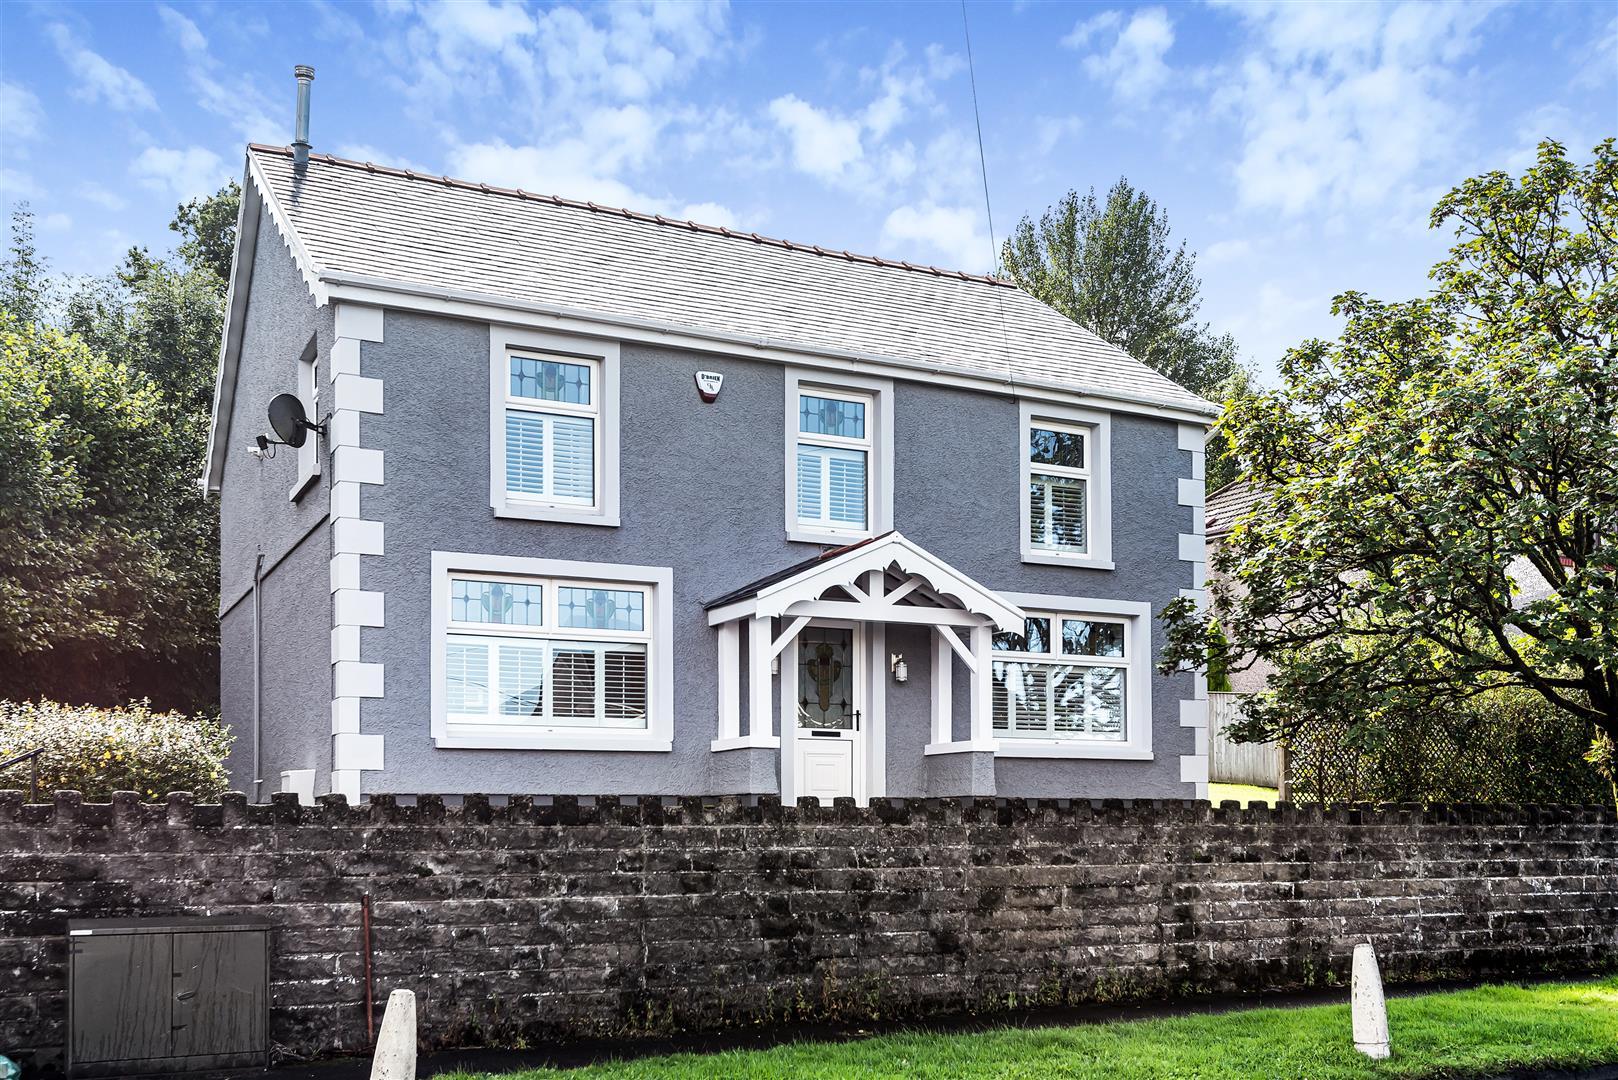 Victoria Road, Wauarlwydd, Swansea, SA5 4SX